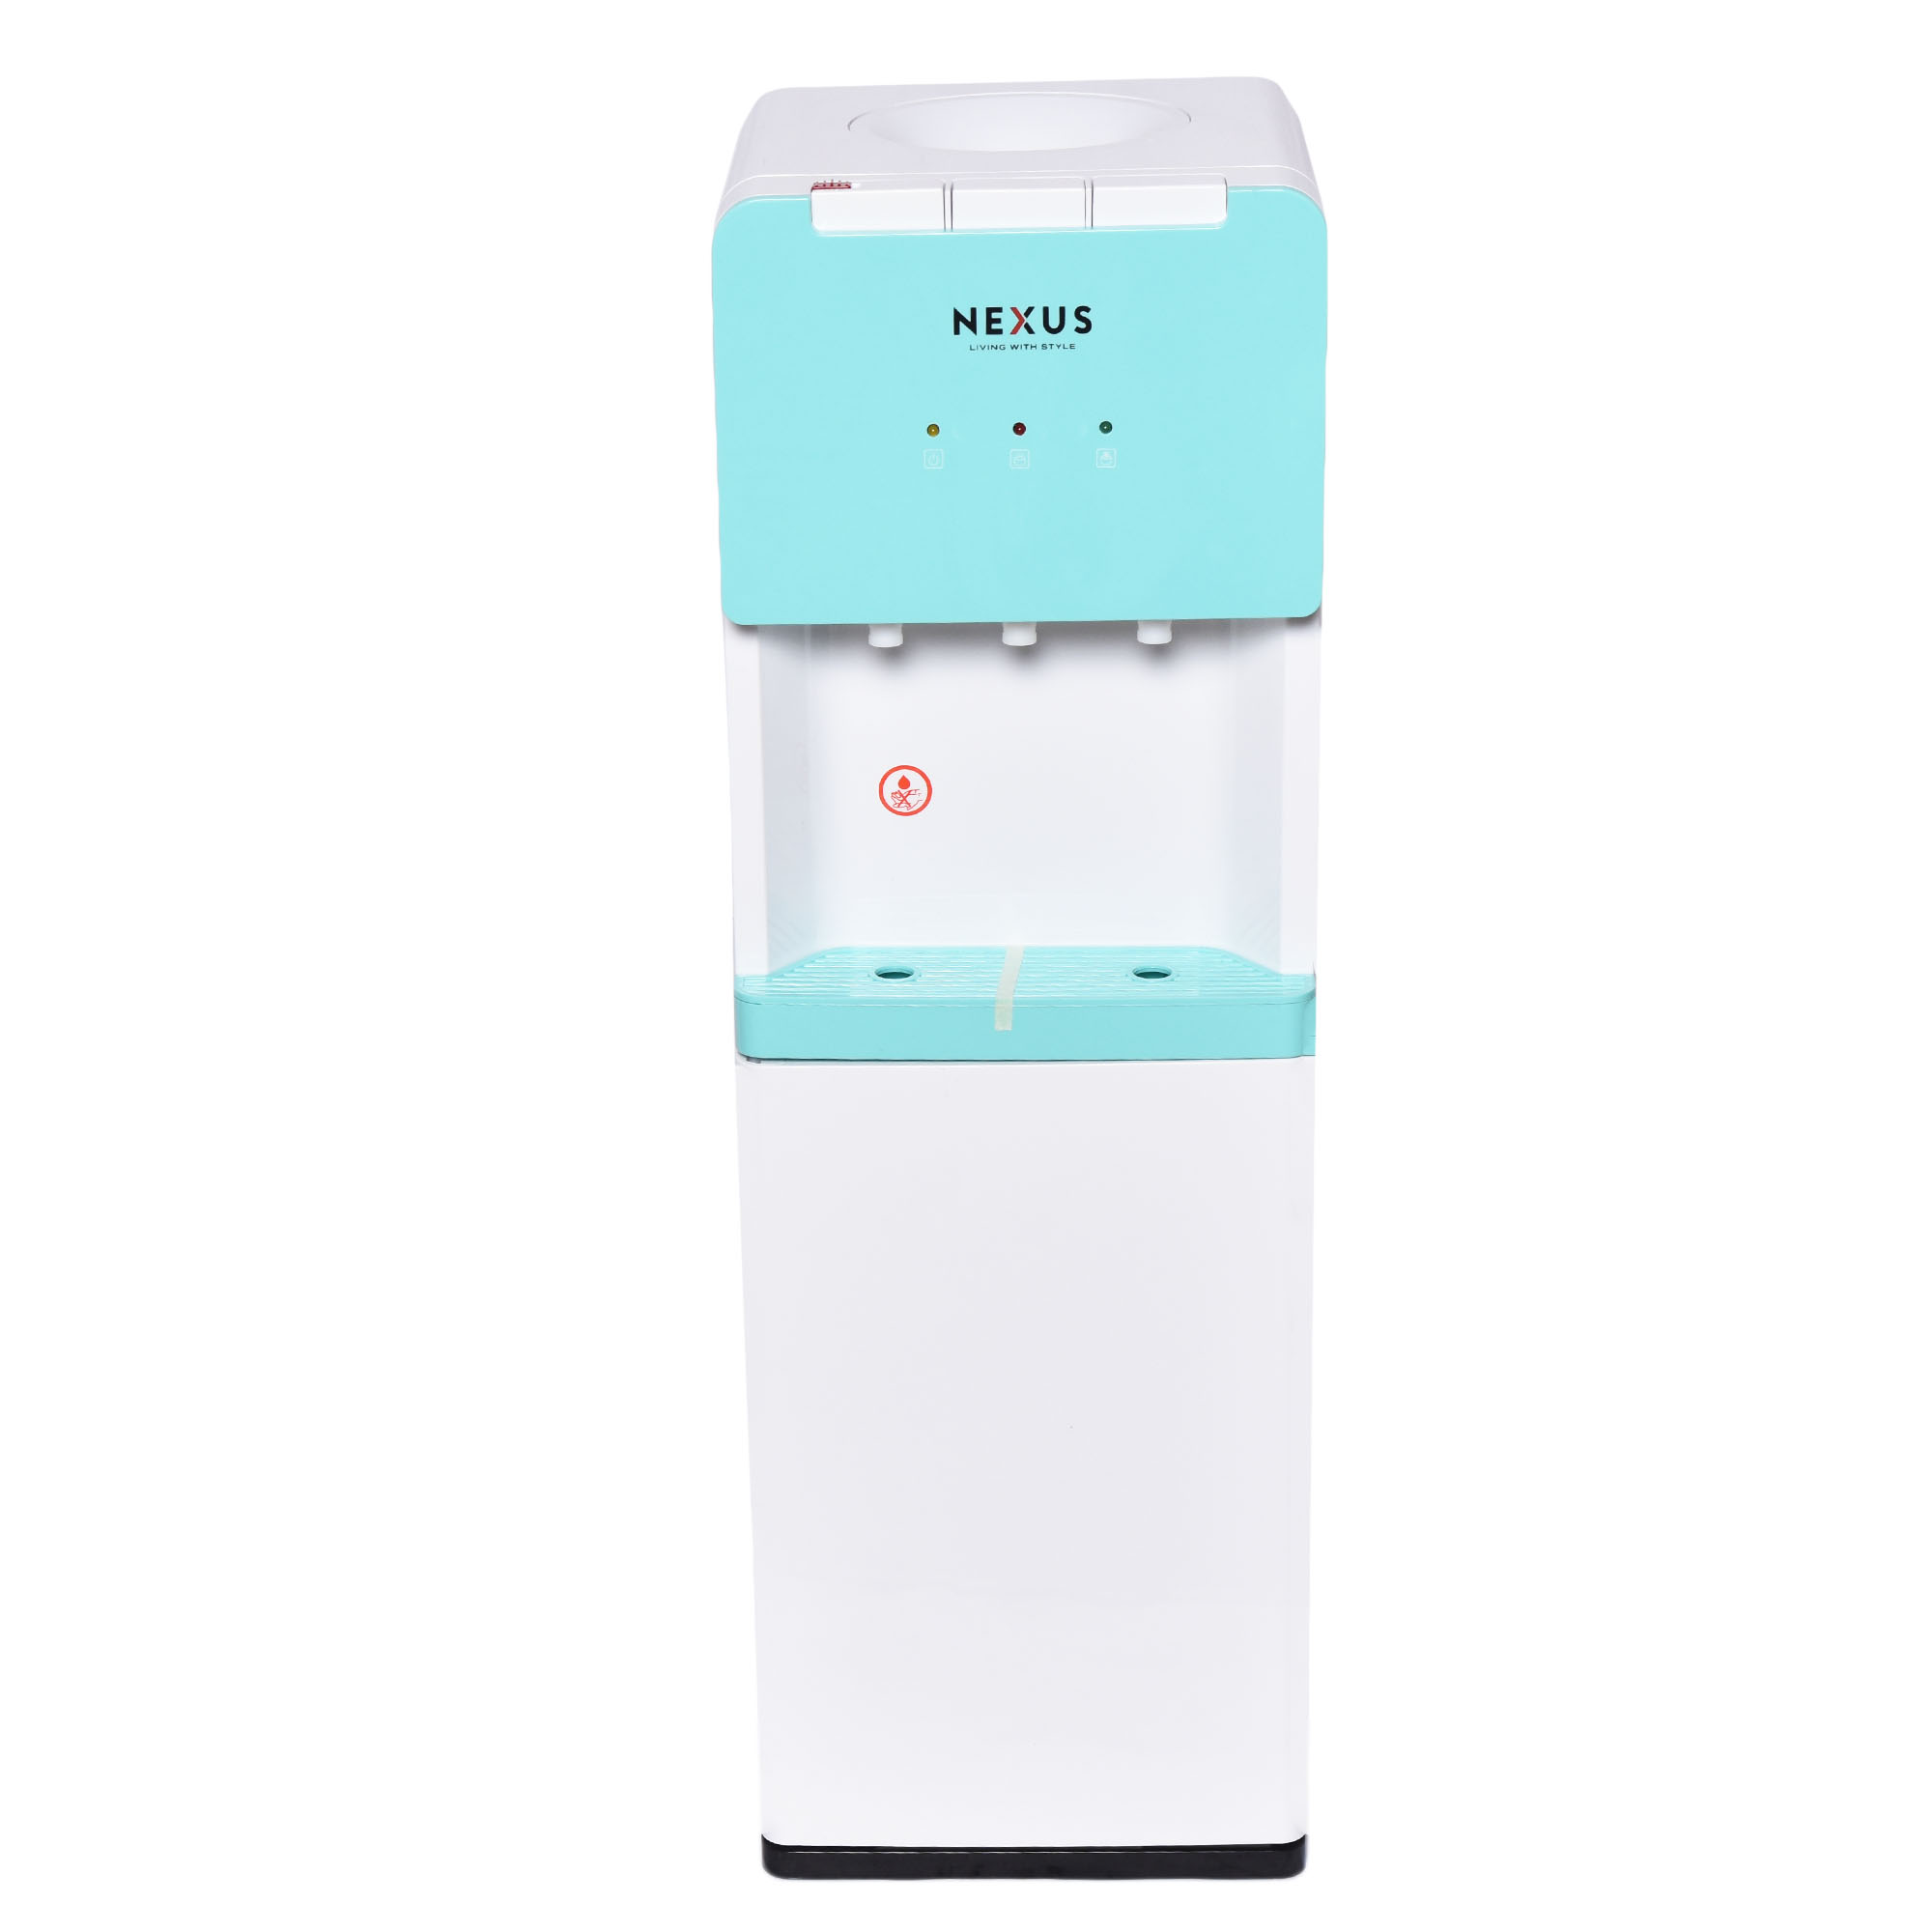 Nexus NX-102 BL, Hot & Cold & Normal - Blue, Dispenser